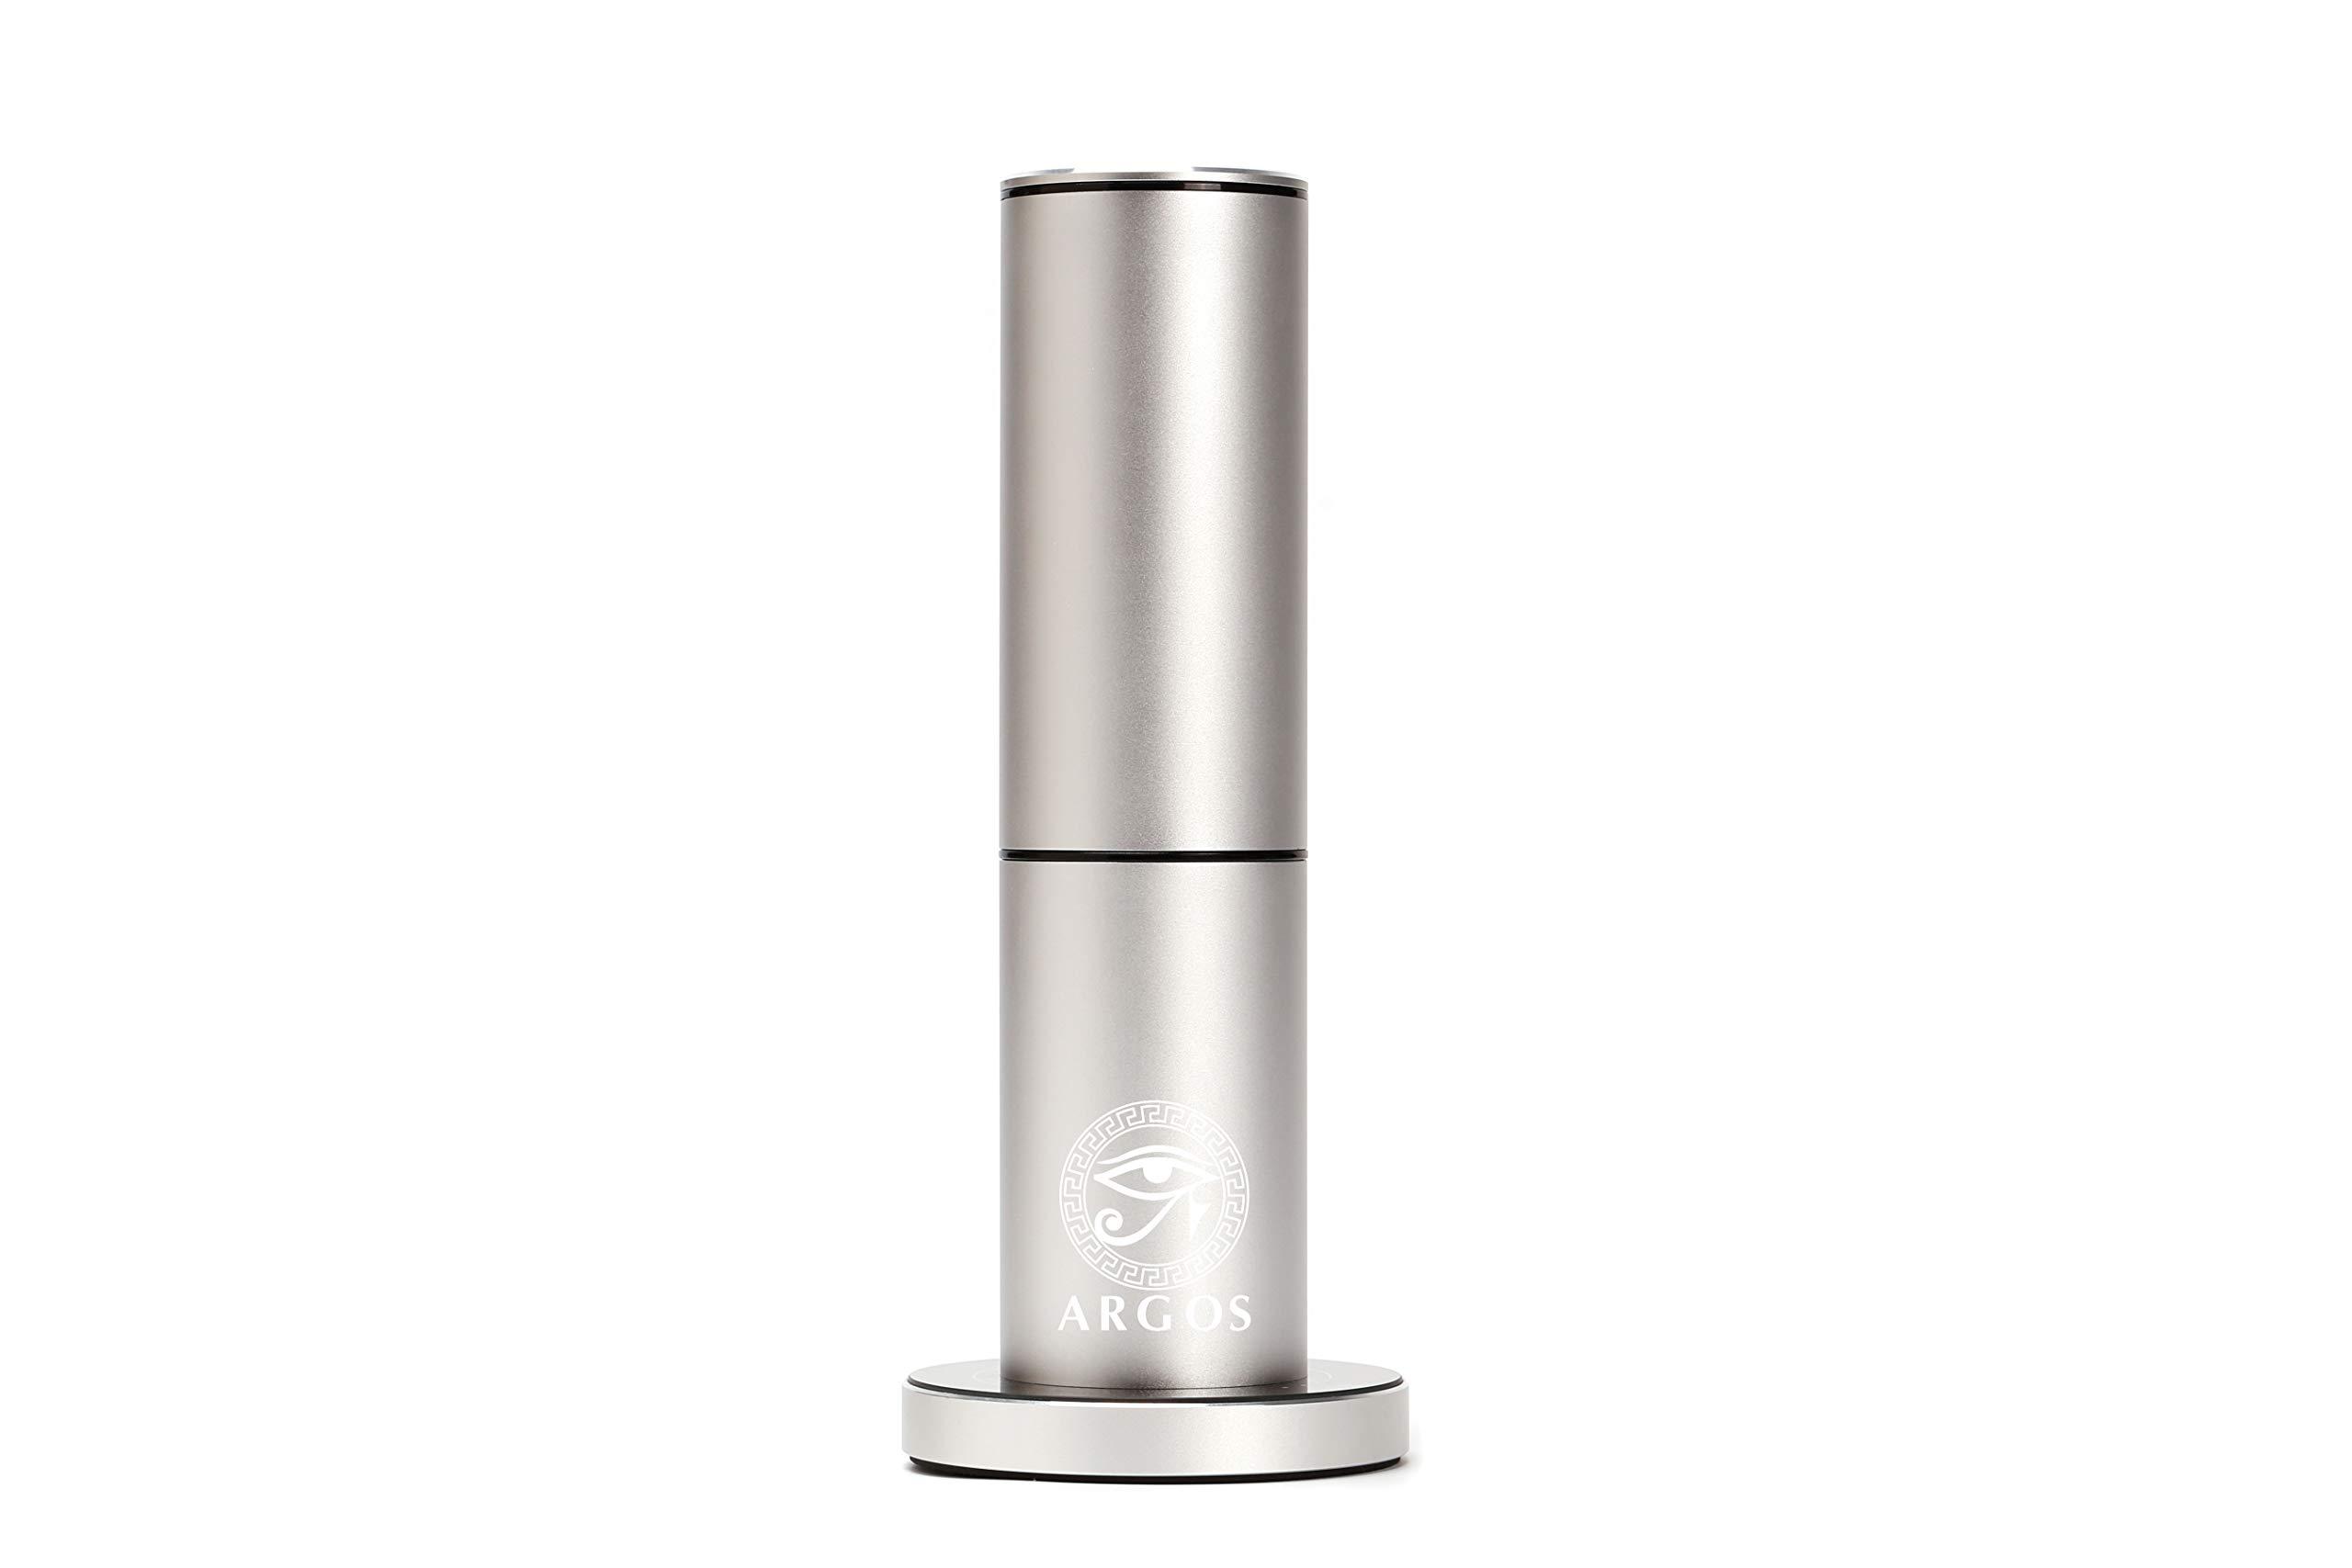 ARGOS Pure Oil Cold Air Diffuser Touch Control (Silver)